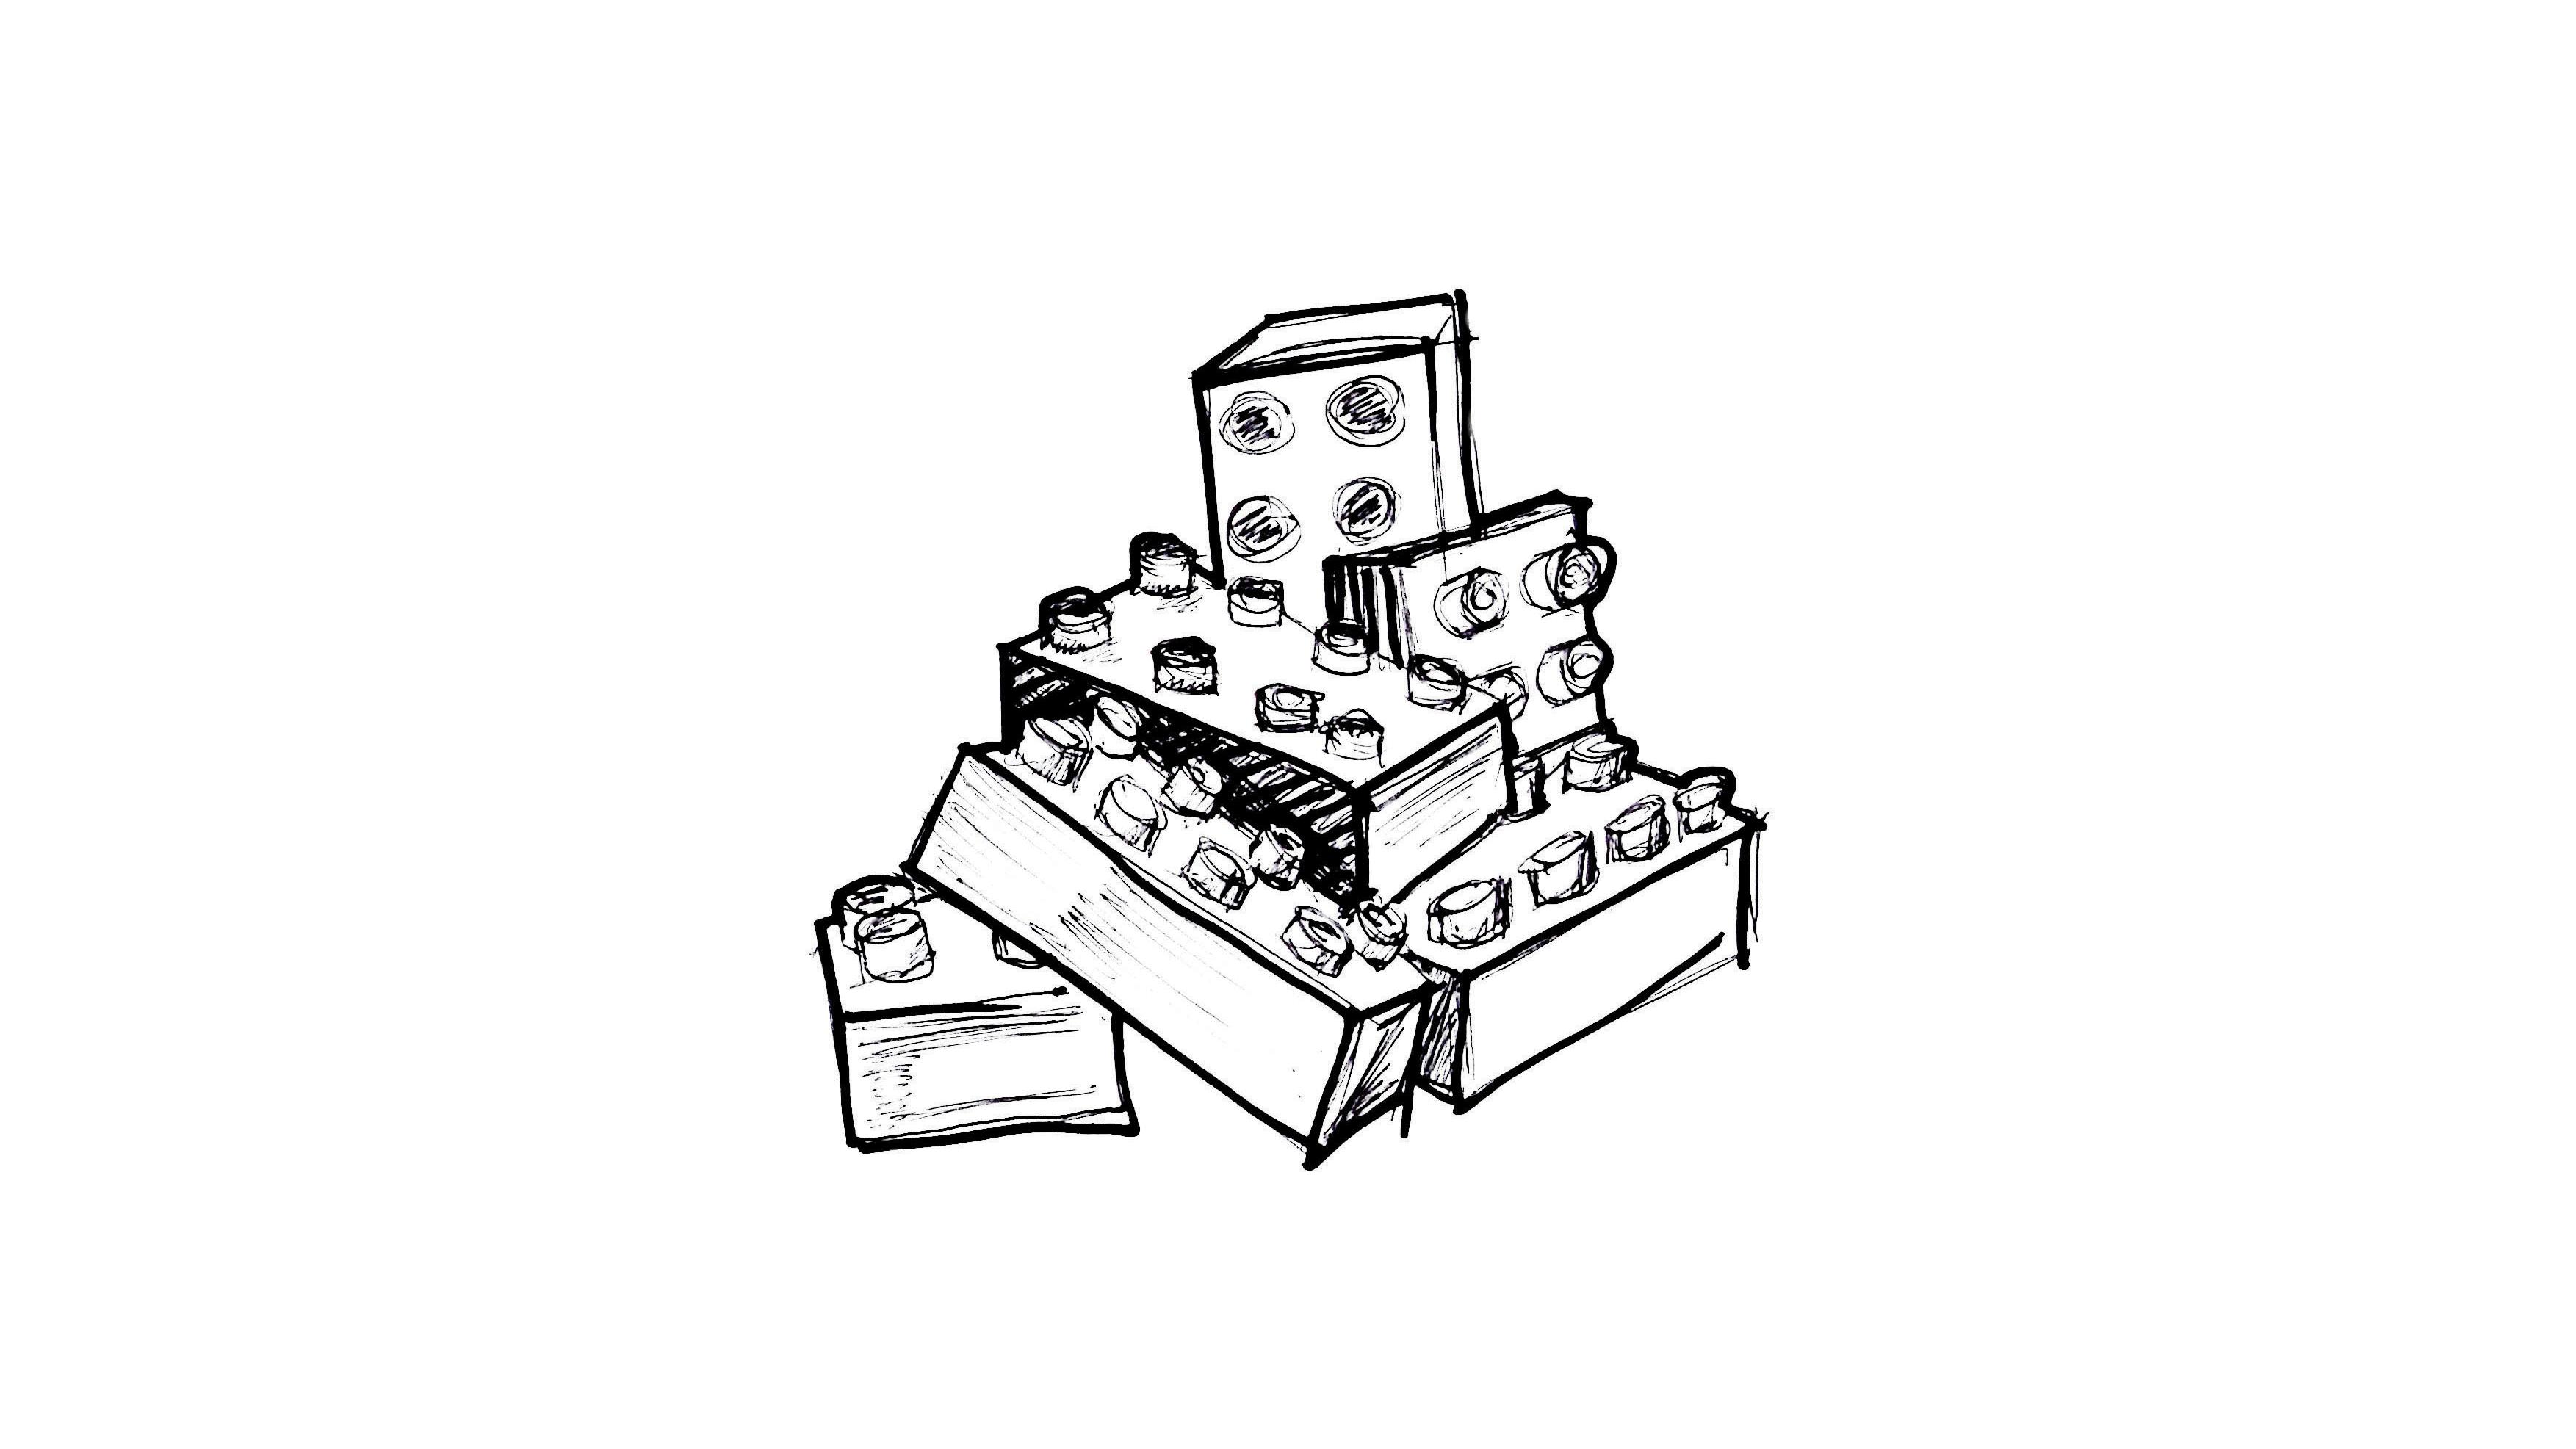 Lego Bricks Creative Work Book Design Inbetween